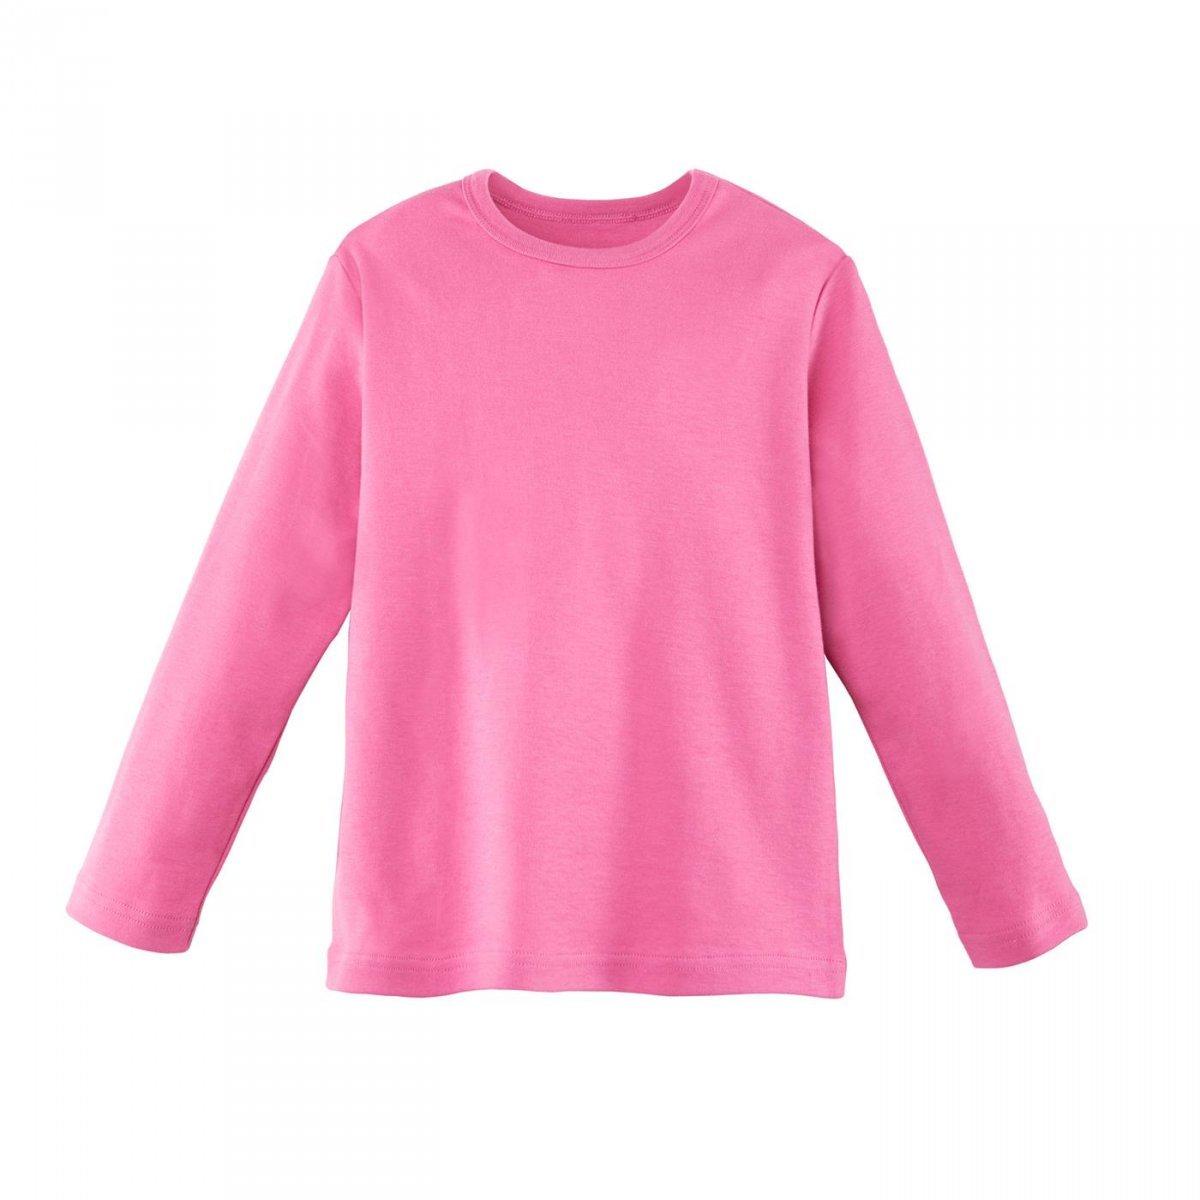 Long sleeve pink shirt girl in organic cotton